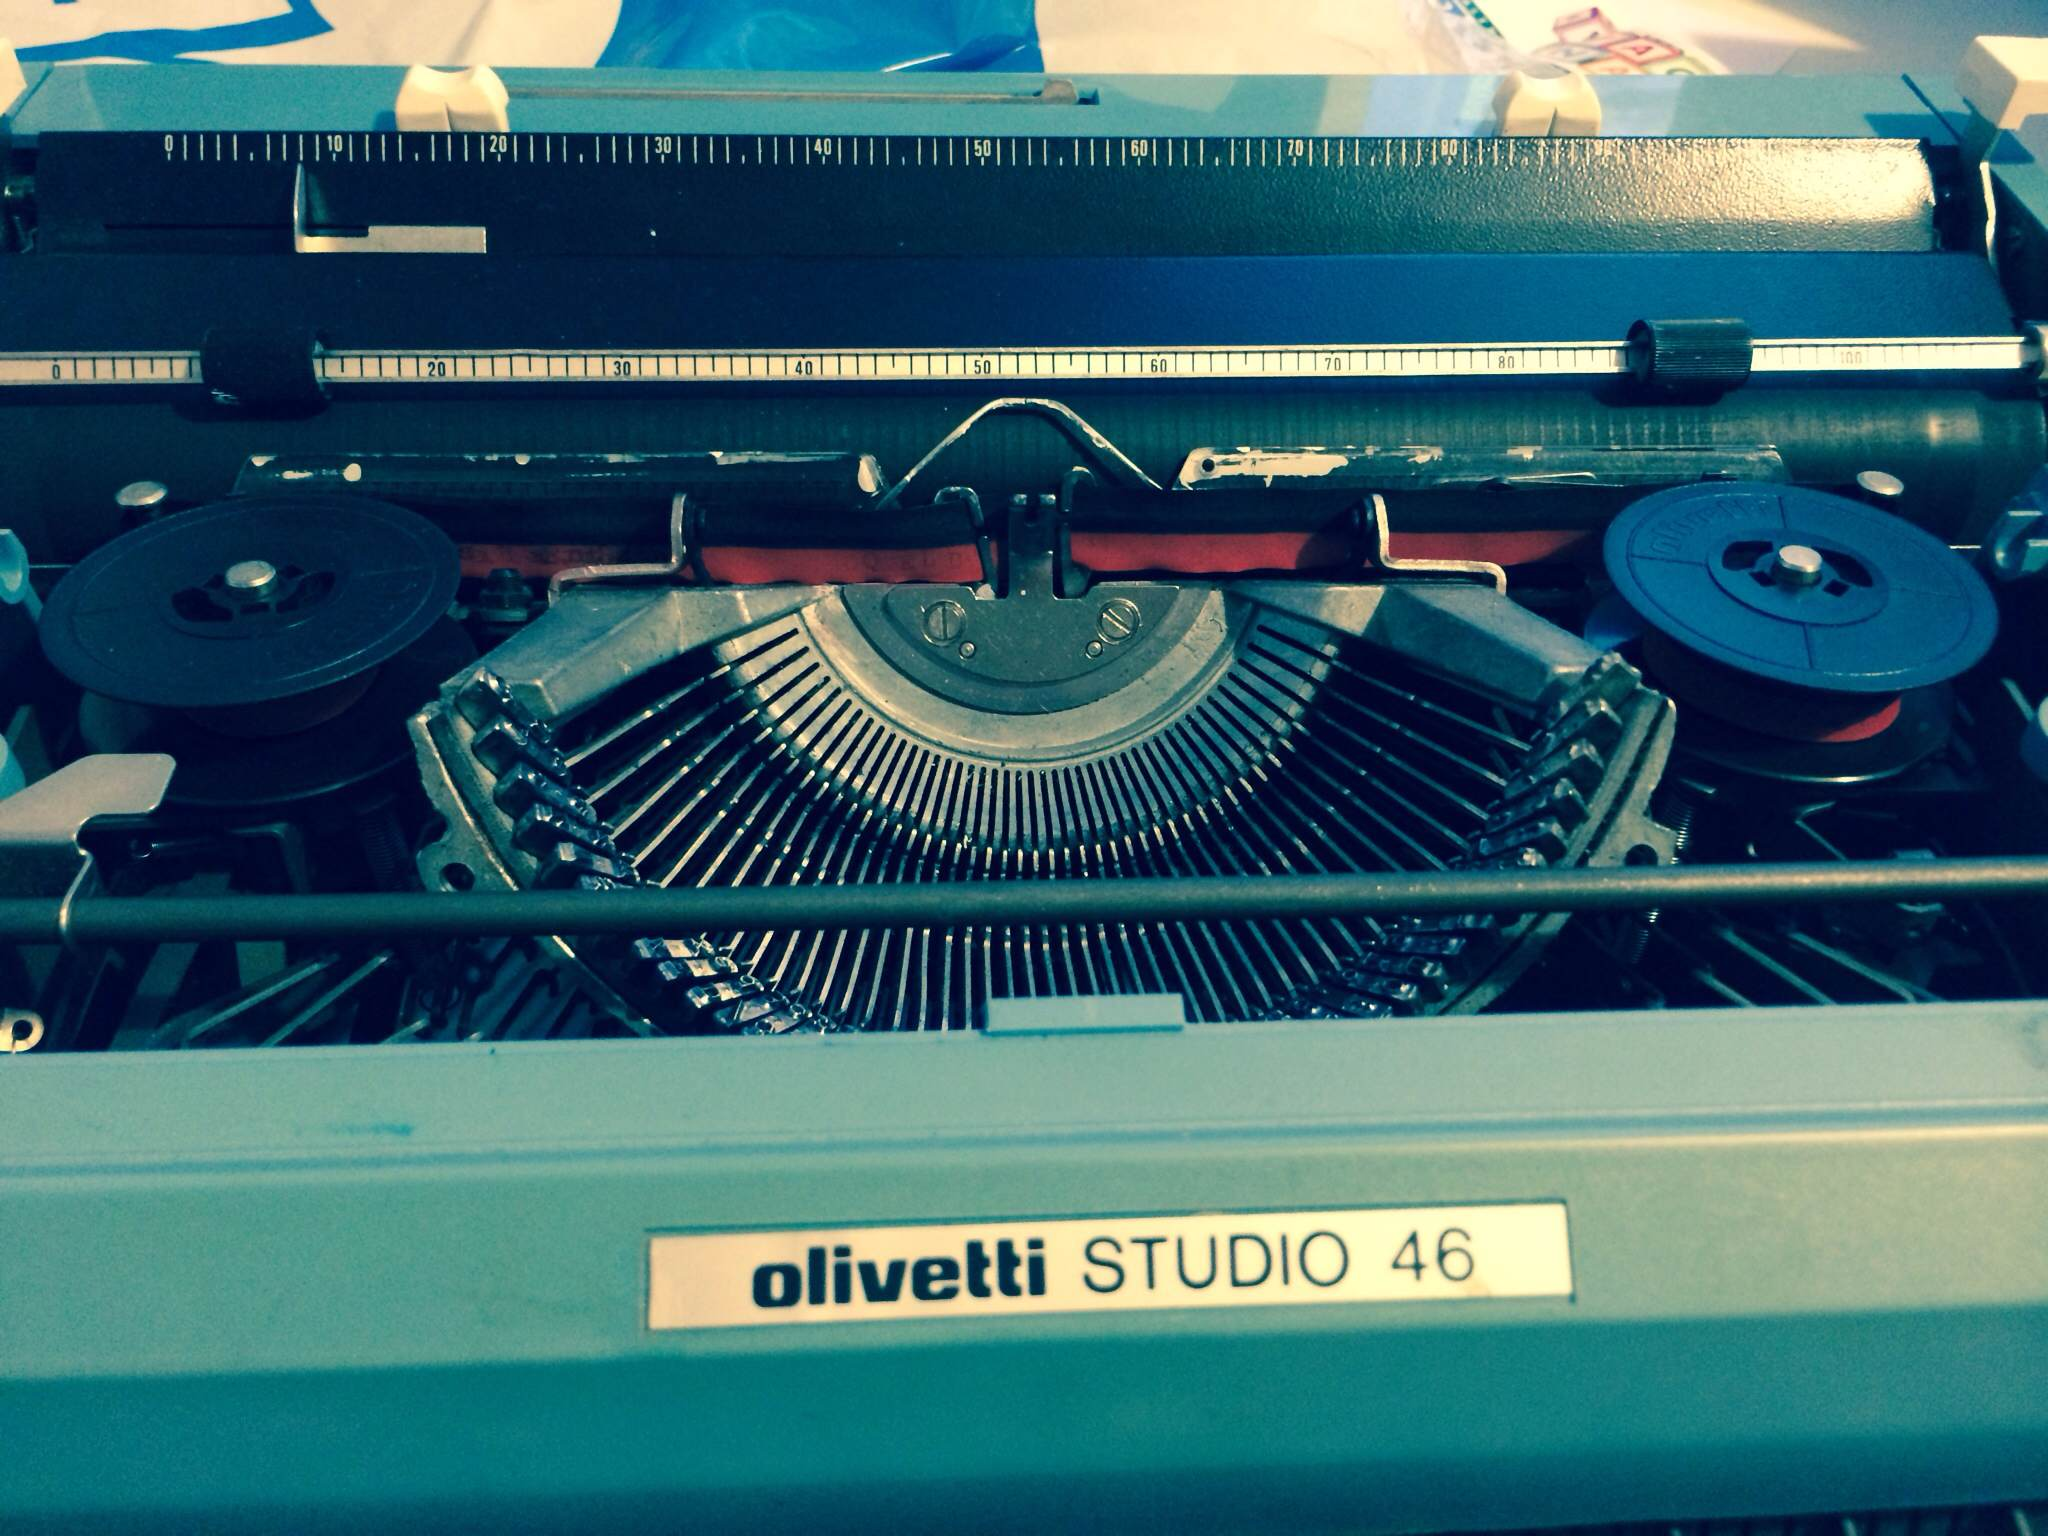 Maquina de escribir olivetti ms 30 plus dating 2